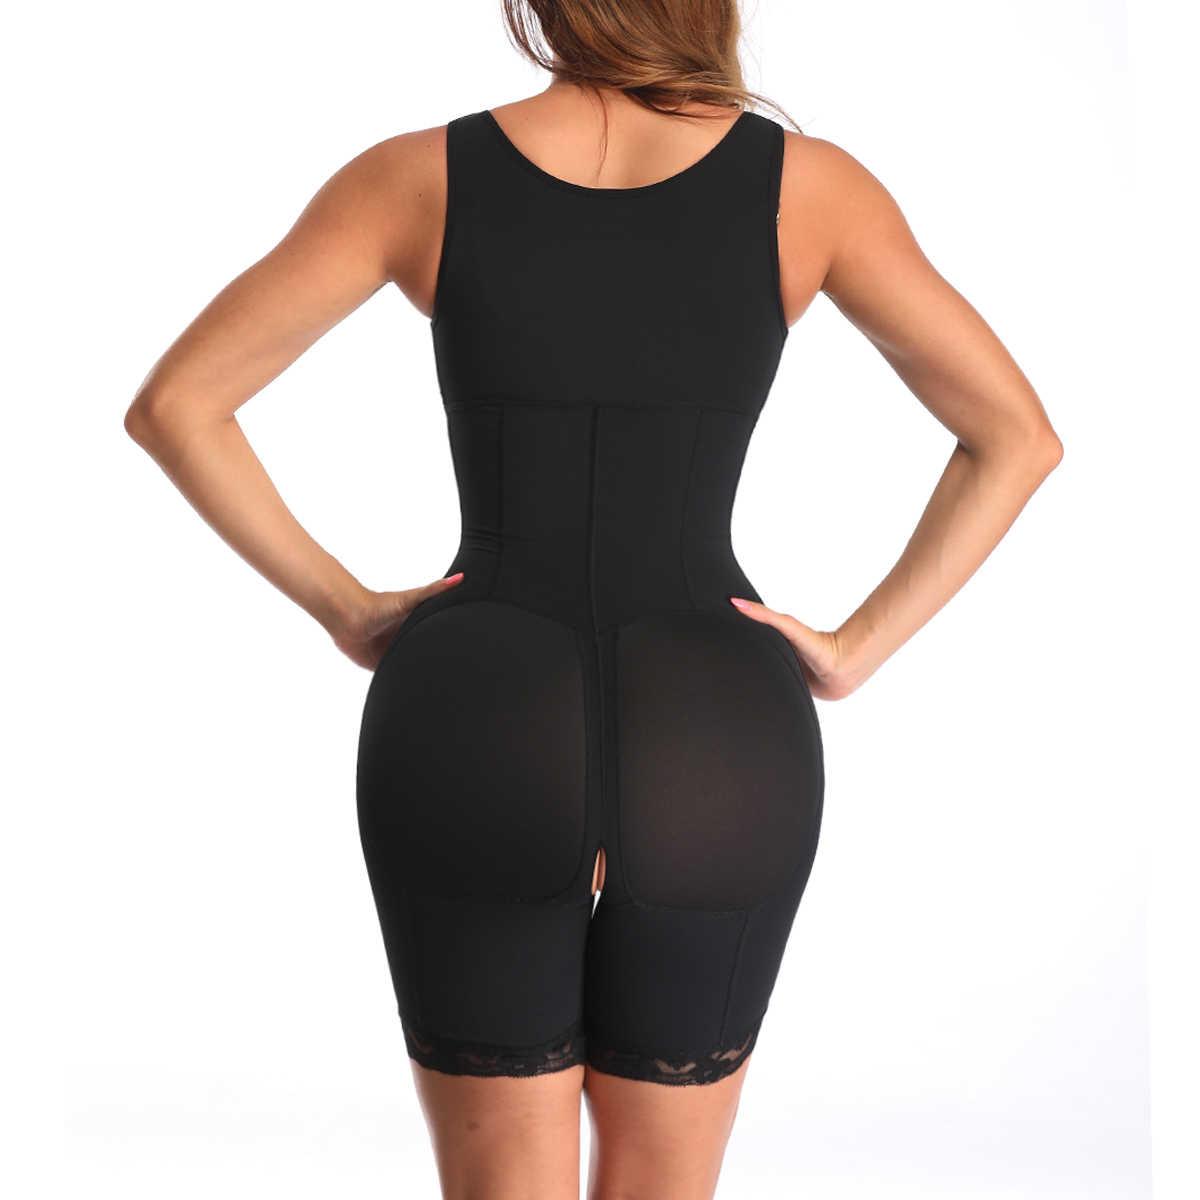 Ropa Moldeadora De Talla Grande 6xl Para Mujer Bodi Reductor De Cintura De Latex Para Mujer Faja De Post Liposuccion Con Clip Postnatal Bodis Aliexpress